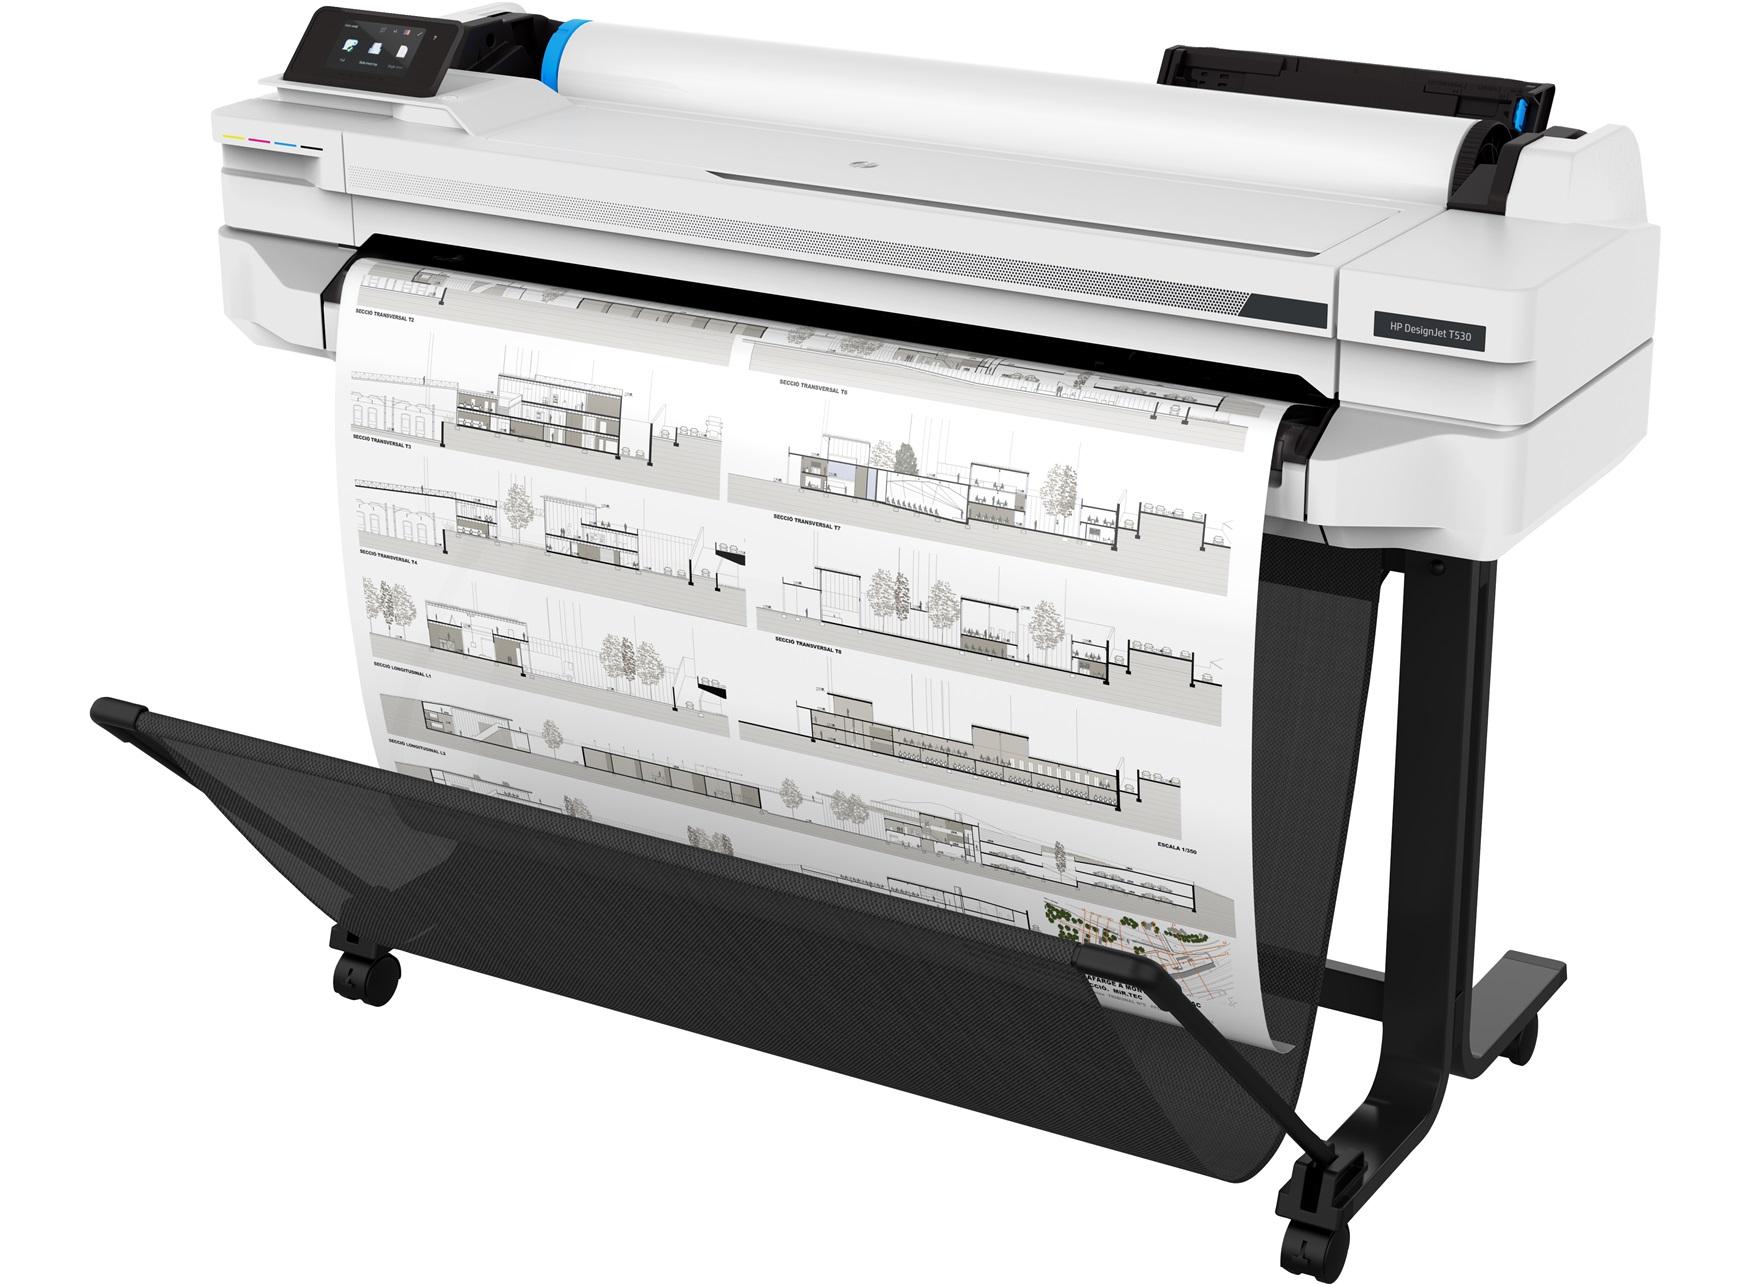 HP Designjet T530 36 inch printer